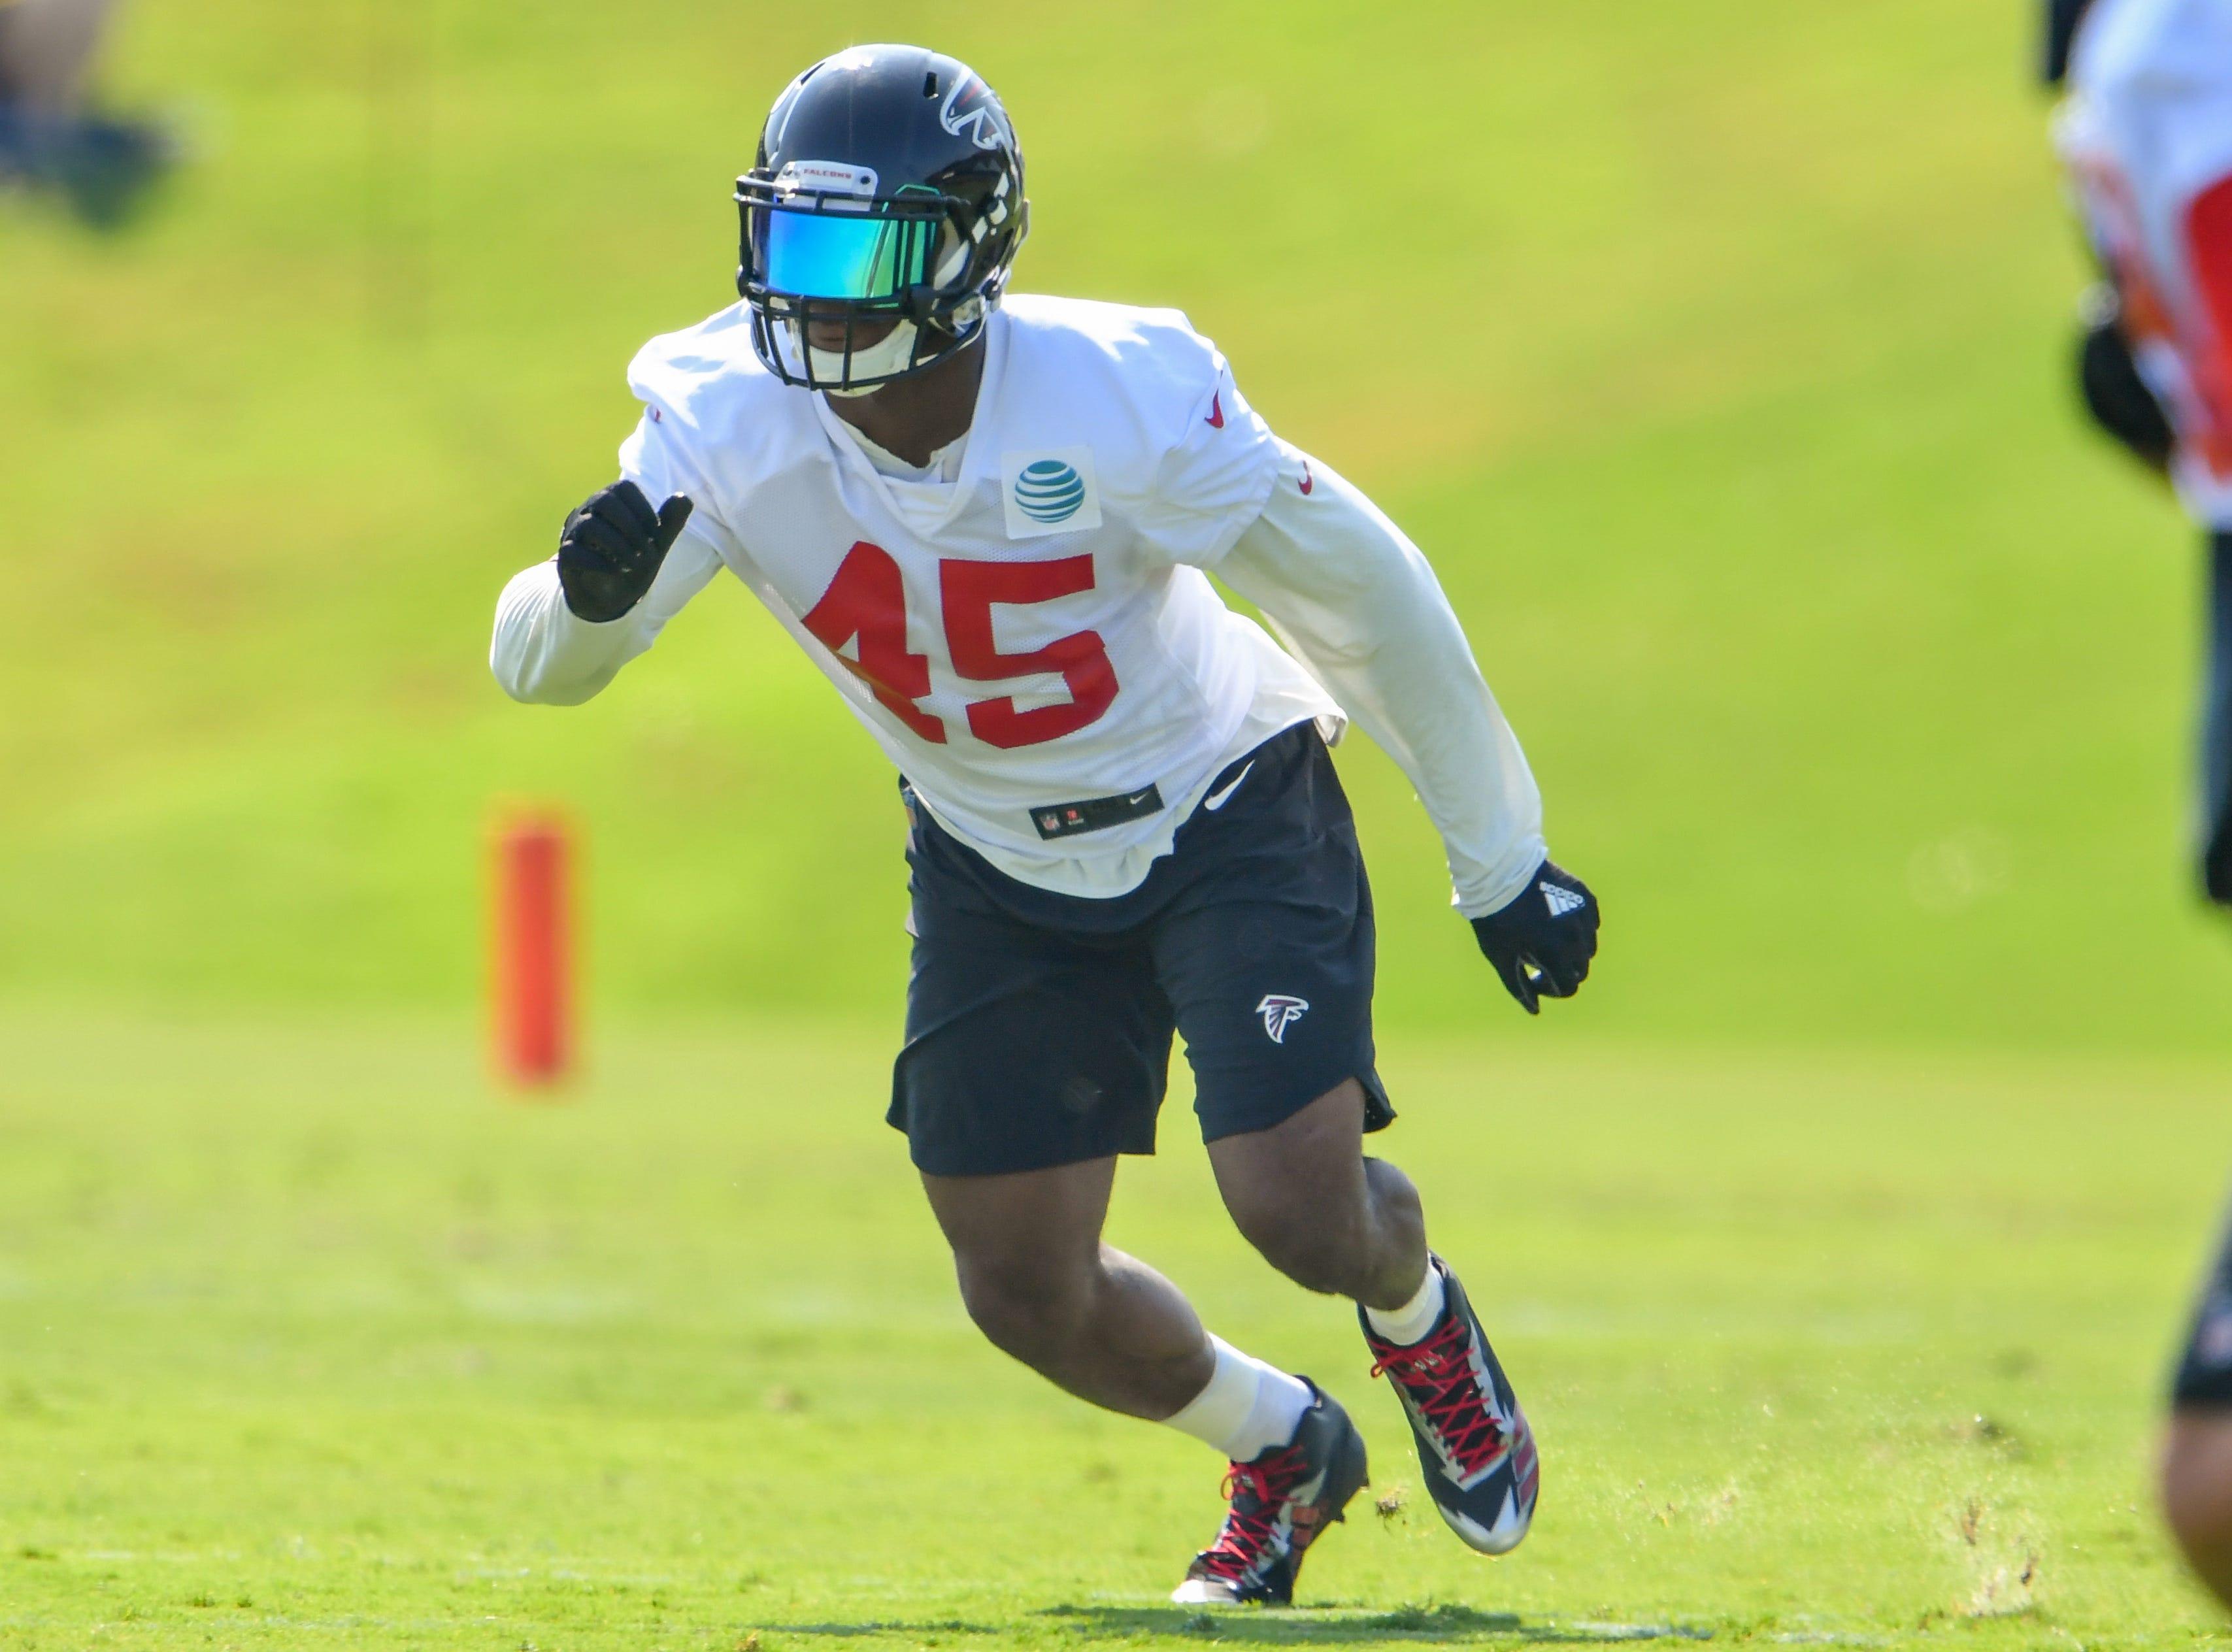 Jul 27, 2018; Flowery Branch, GA, USA; Atlanta Falcons linebacker Deion Jones (45) runs to the ball during Training Camp at Falcons Training Complex. Mandatory Credit: Dale Zanine-USA TODAY Sports